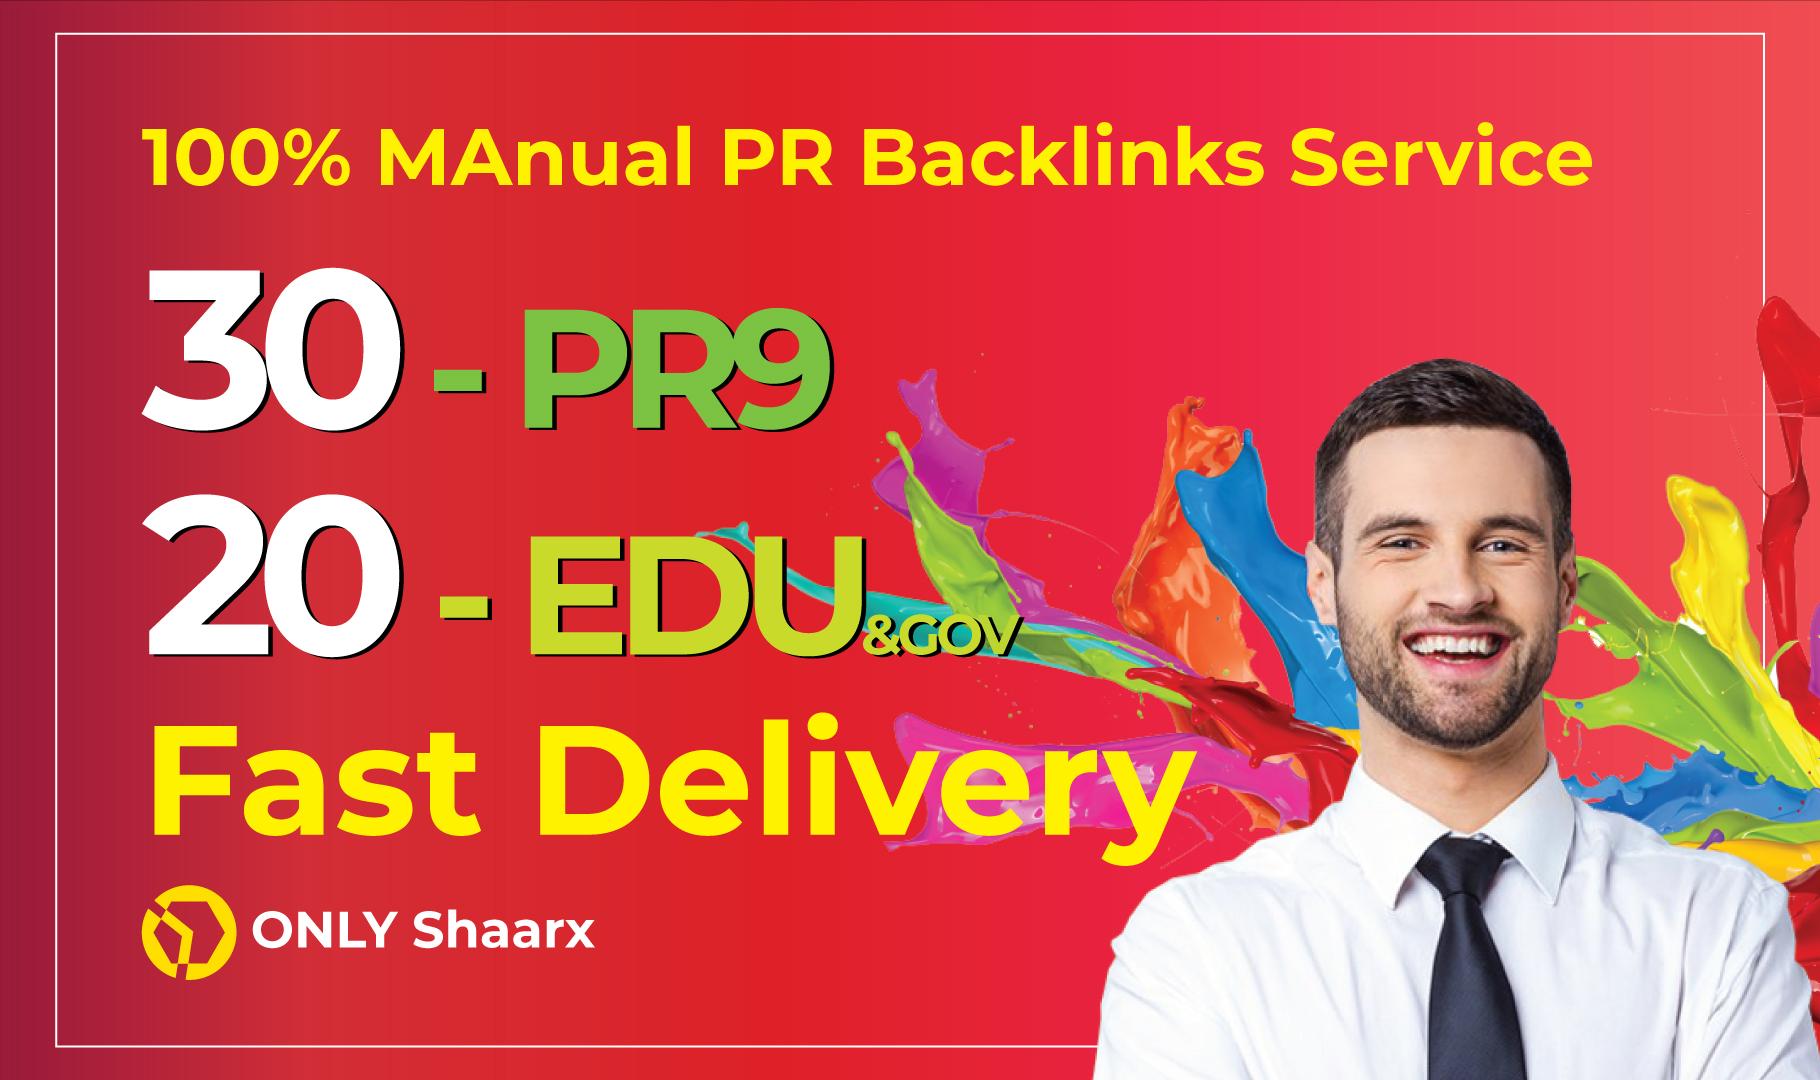 Manually Create 50 Links 30 PR9+20EDDU/GOV High Trust Authority Safe SEO Backlinks